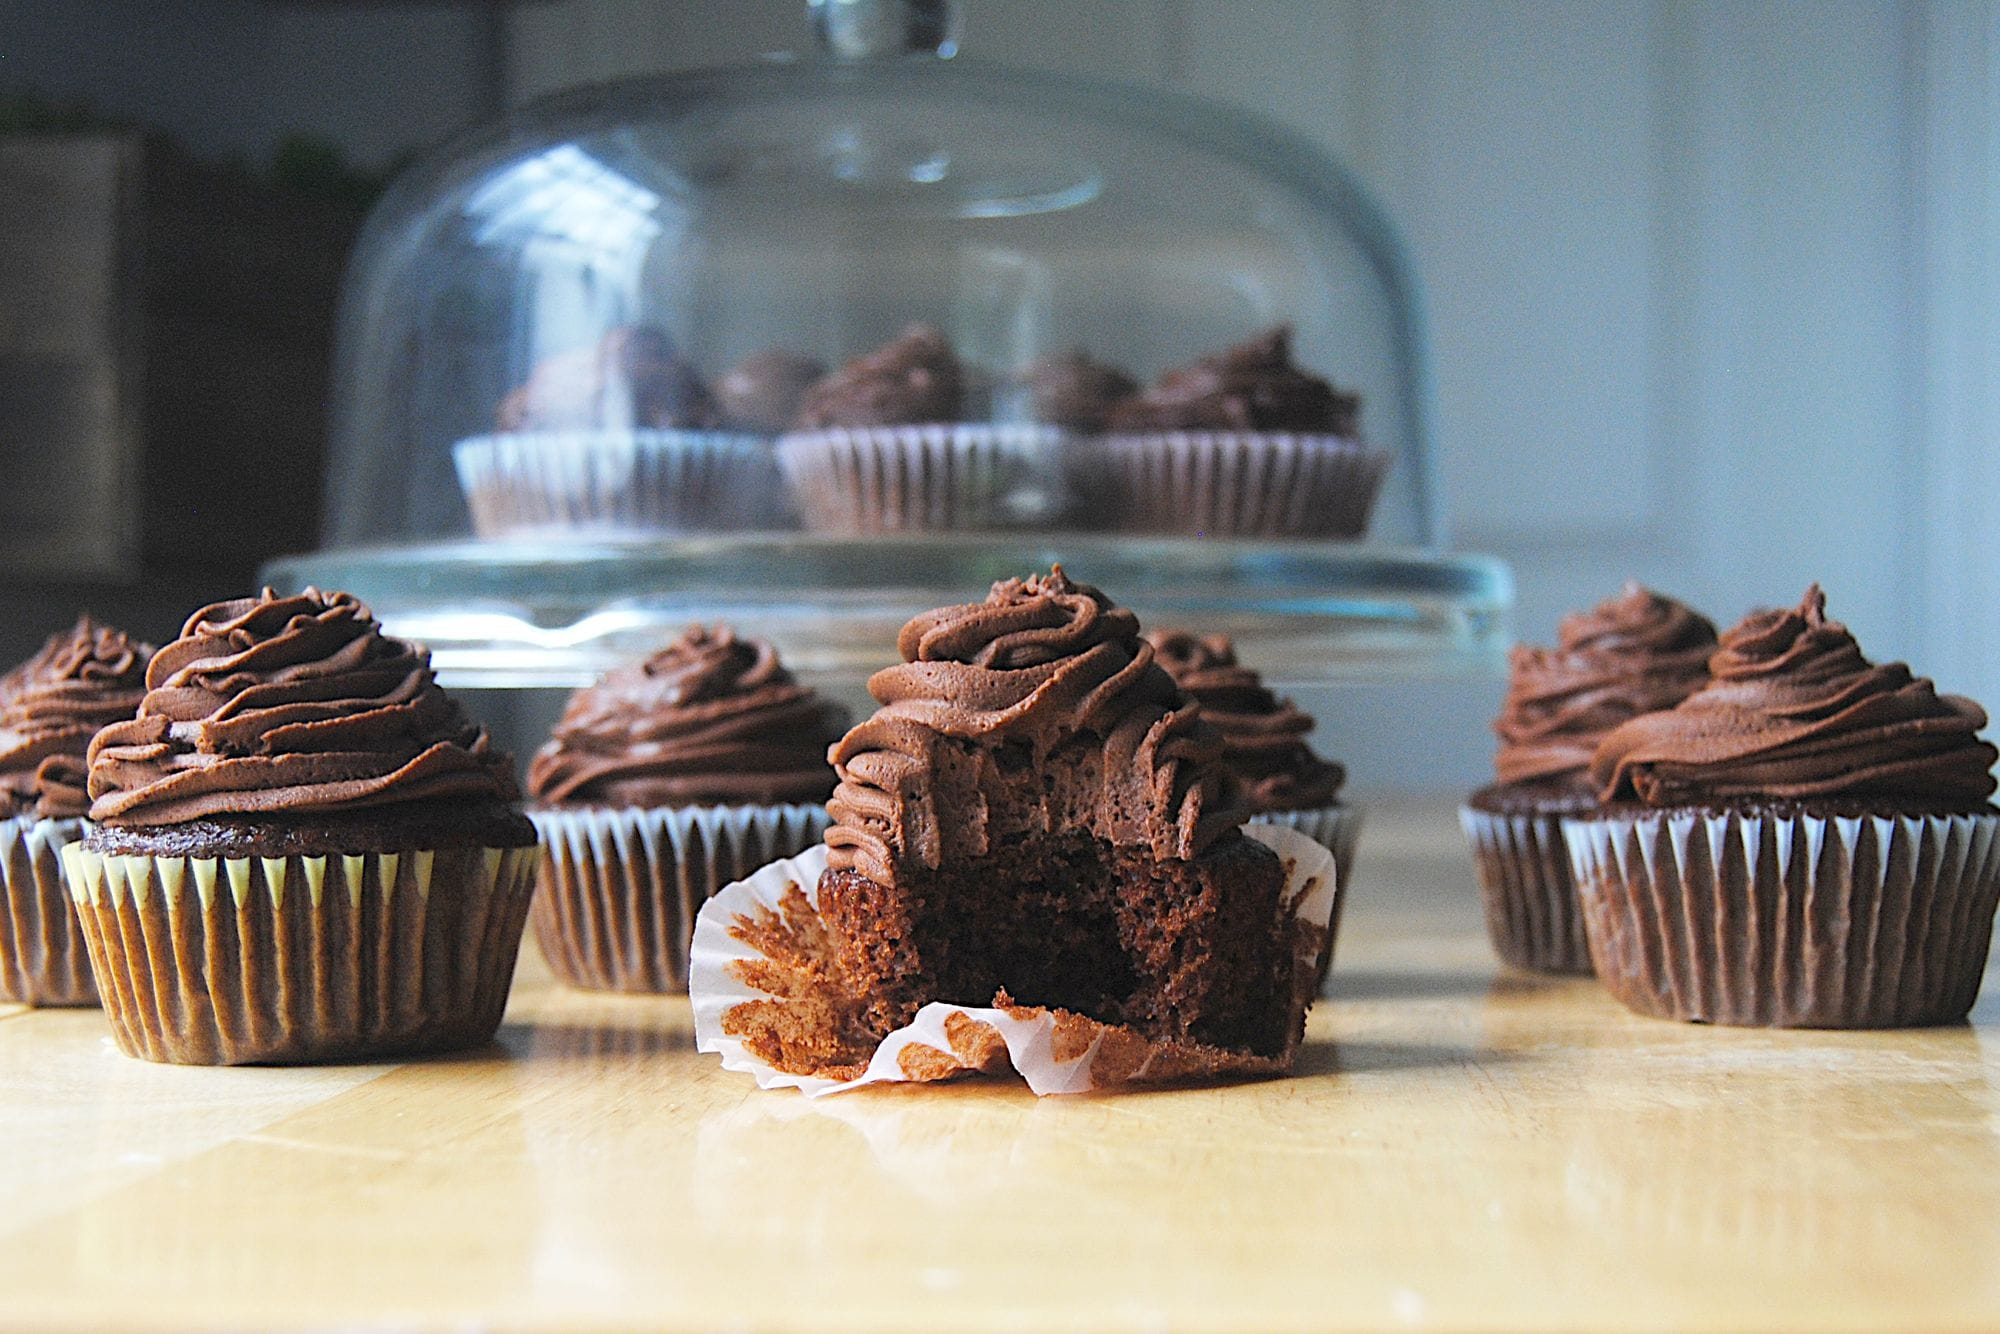 Chocolate on Chocolate Cupcakes - With Bite 2